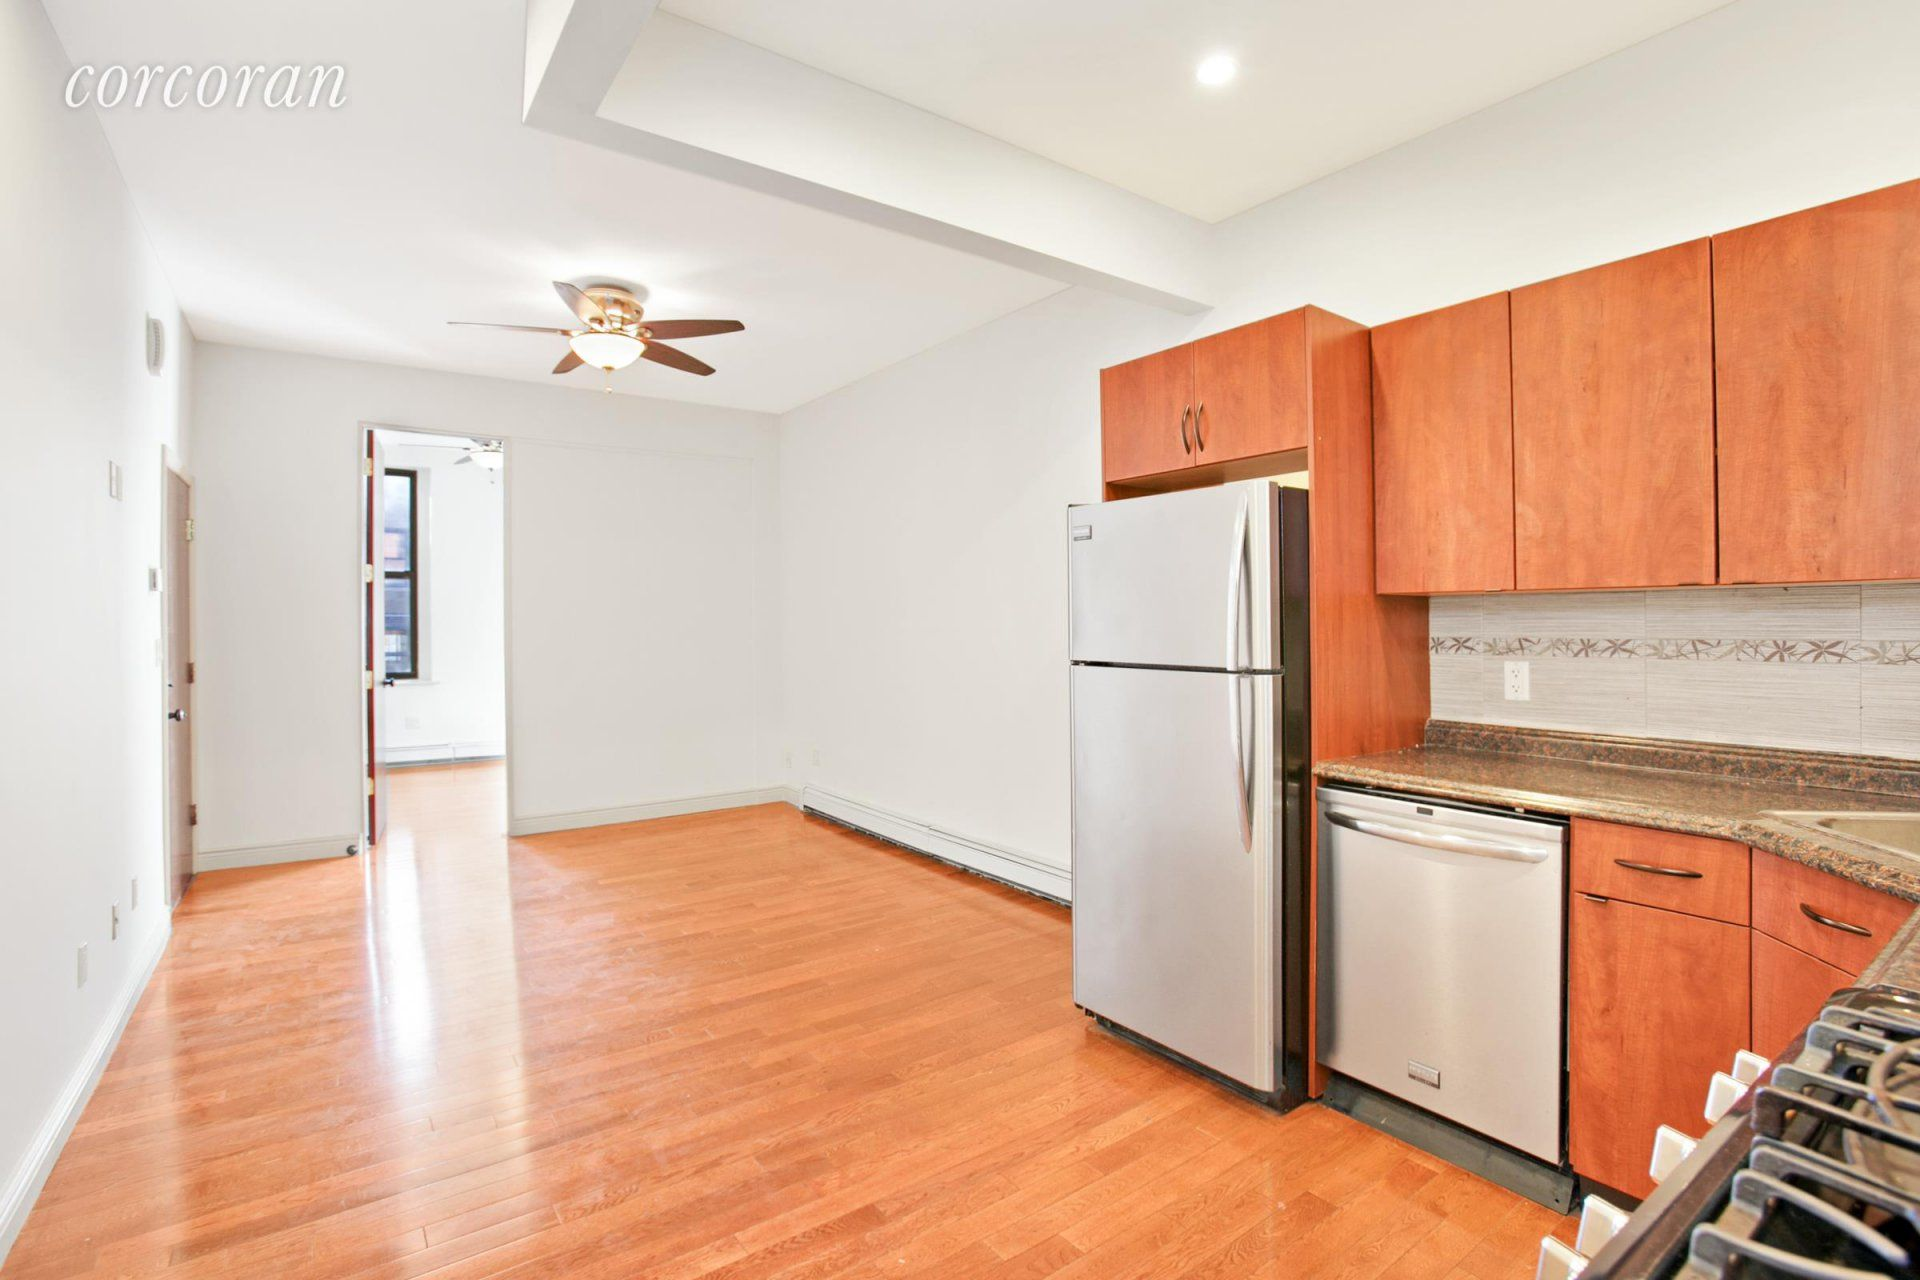 Ad Rental Apartment Brooklyn (11215) ref:5642138 | 1 ...